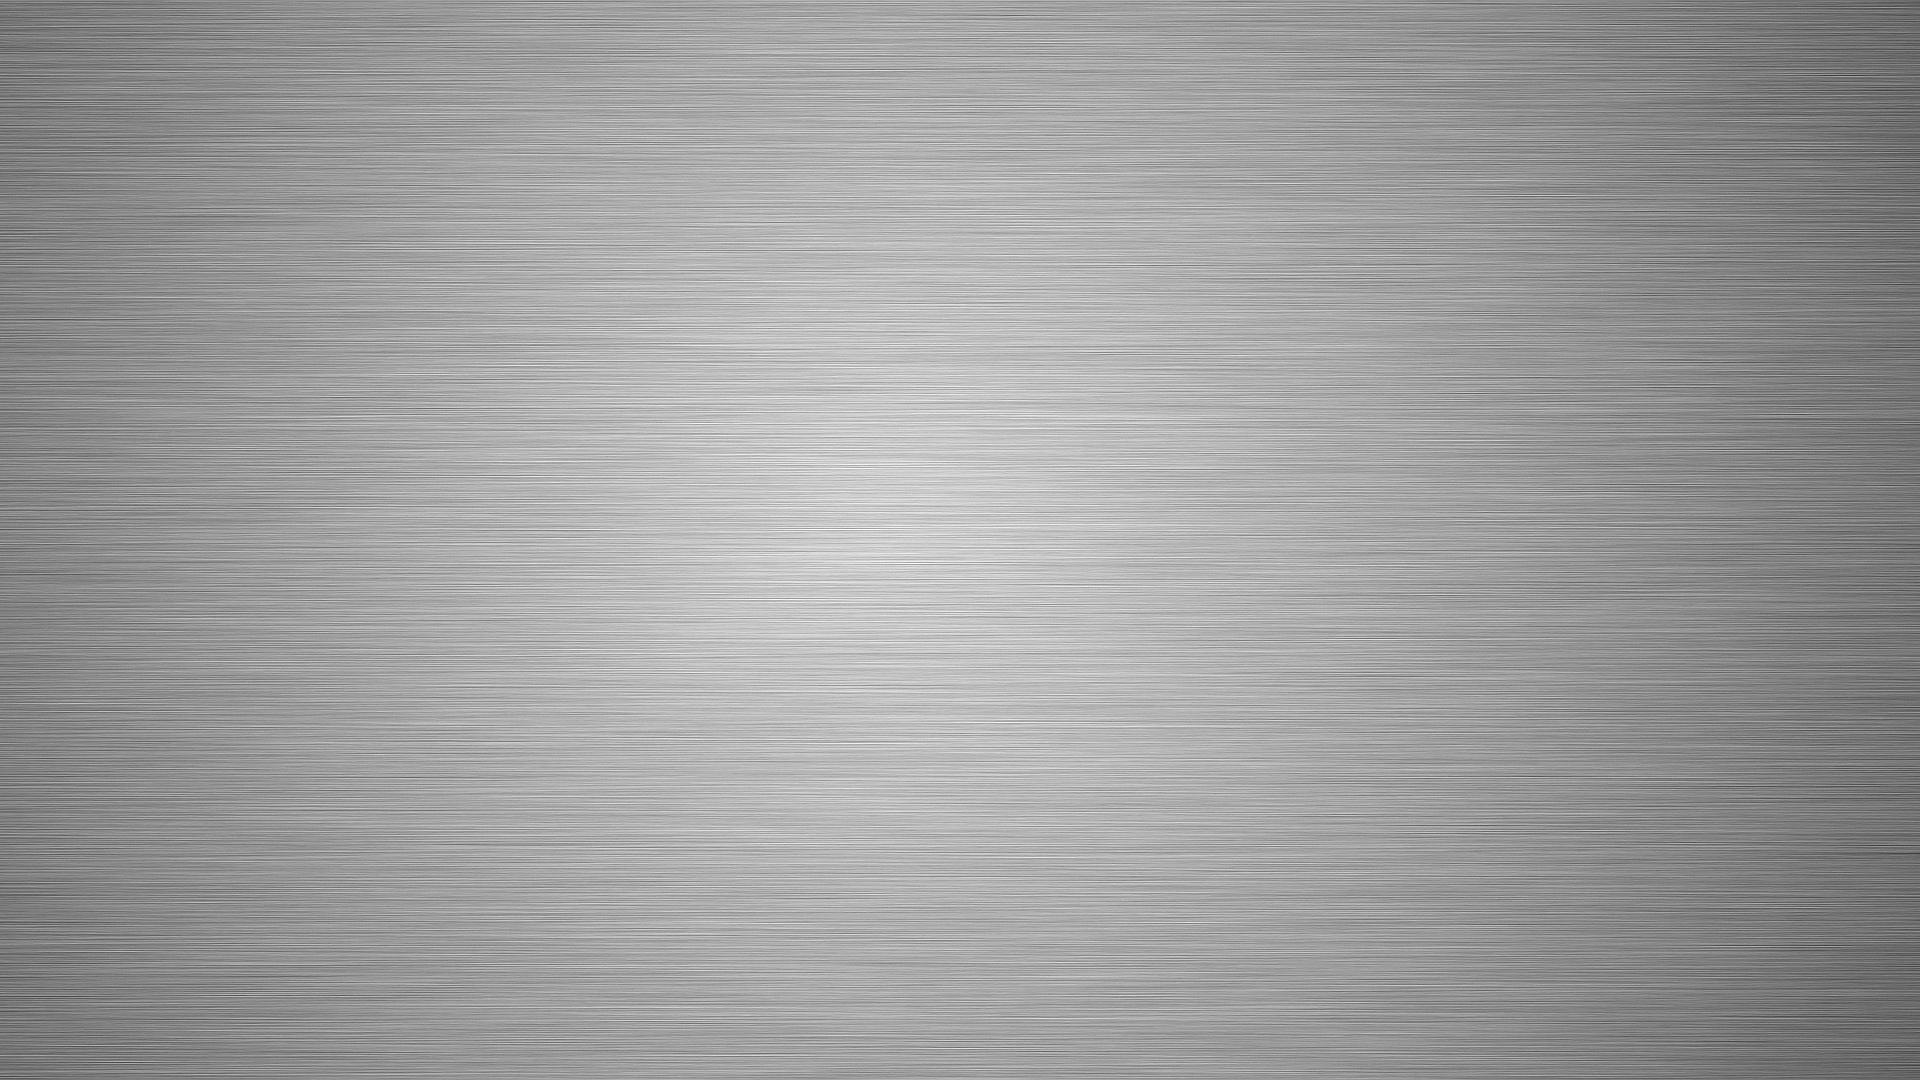 Brushed Aluminum Wallpapers 1920x1080